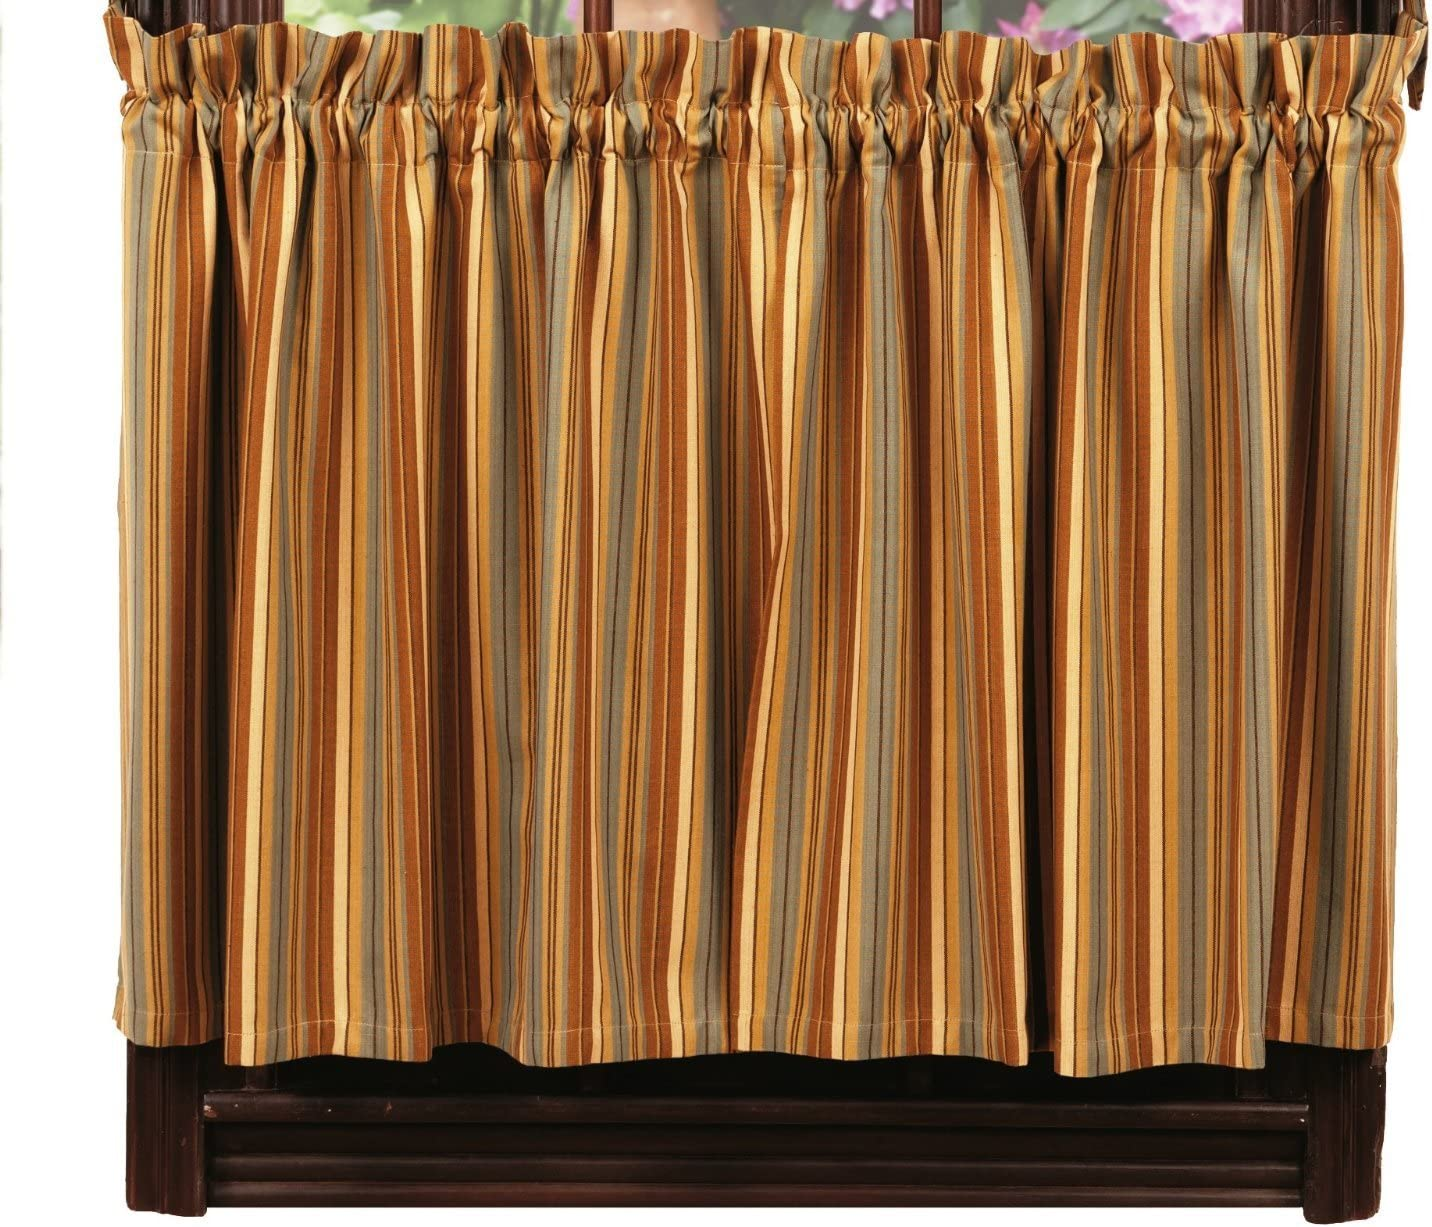 Popular popular IHF New item New Cordwood Design 36